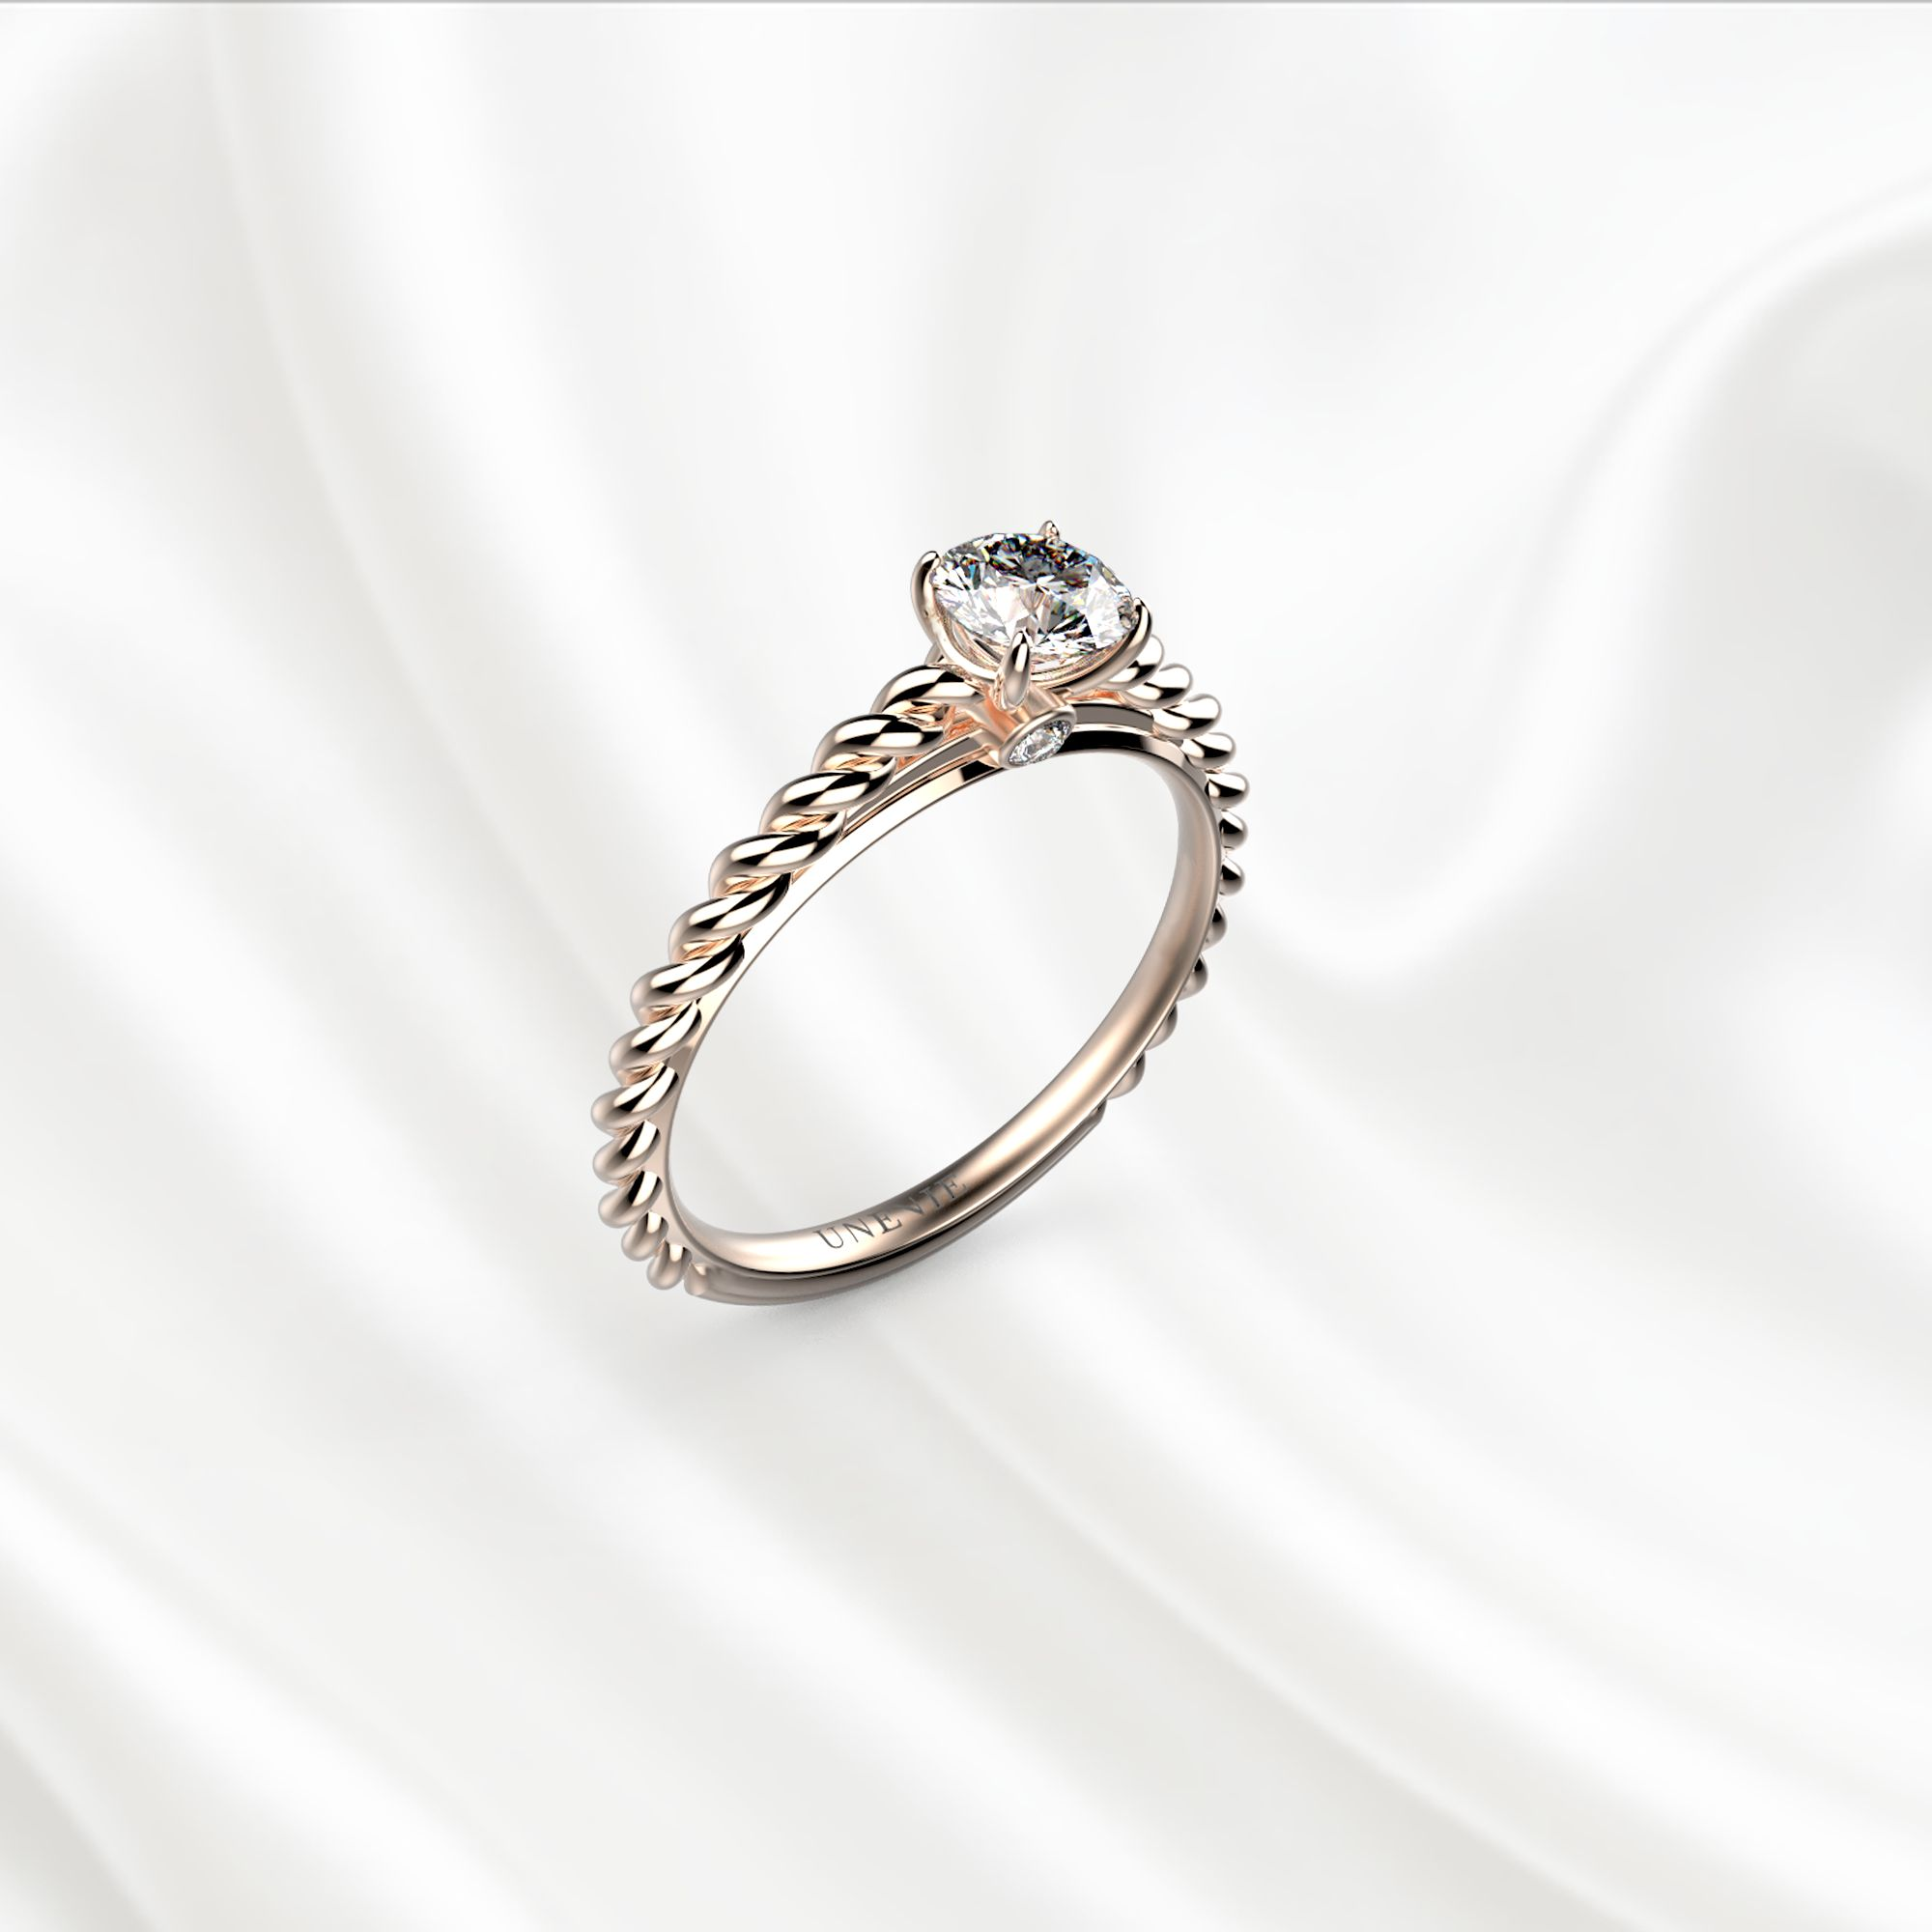 N14-1 Помолвочное кольцо из розового золота с бриллиантом 0.35 карат